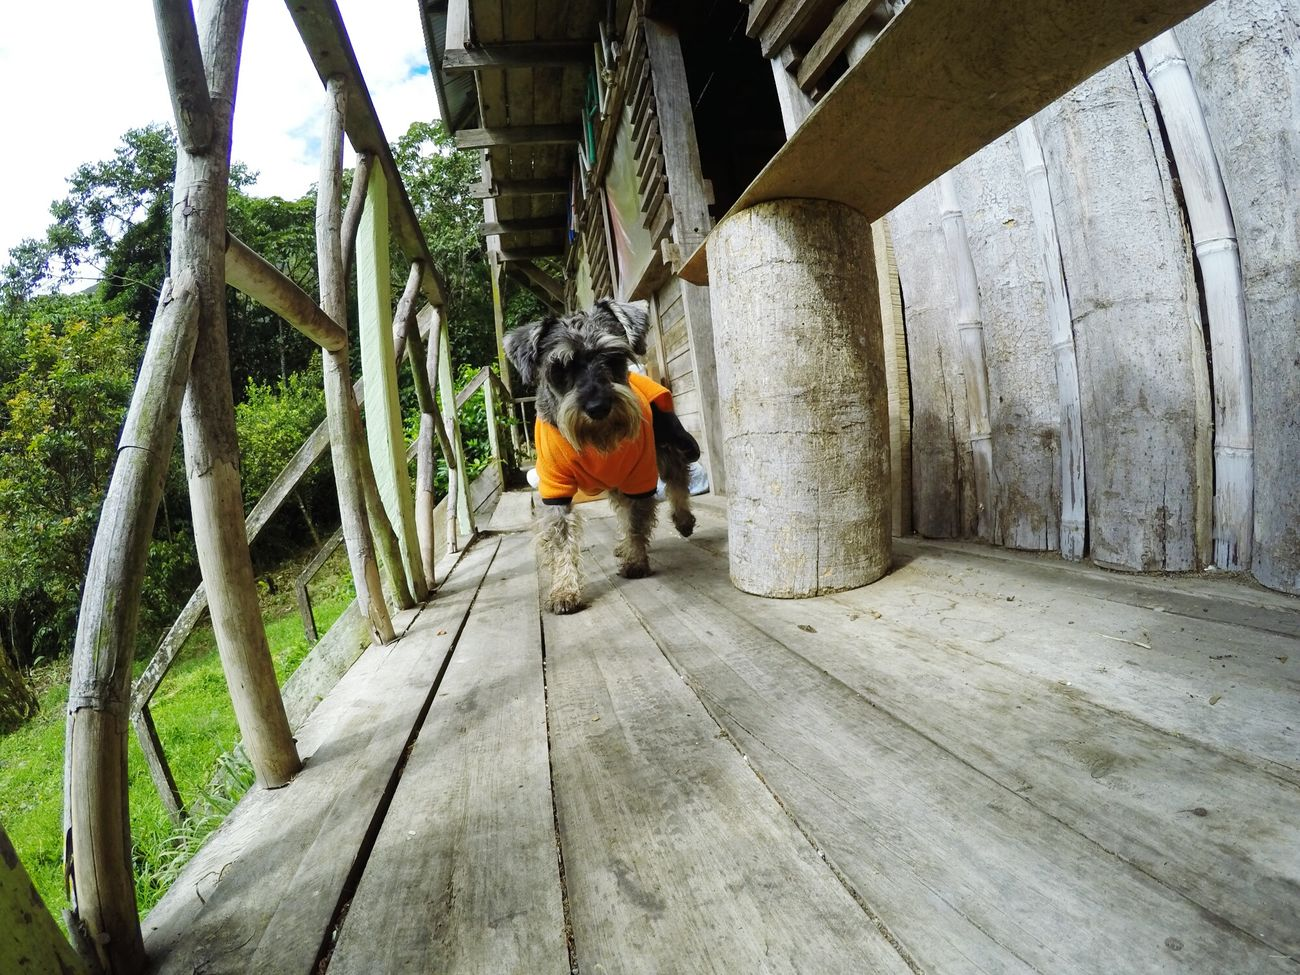 Ricci en la maravillosa Madre Selva, vestido de Goku. Gopro Hero 4